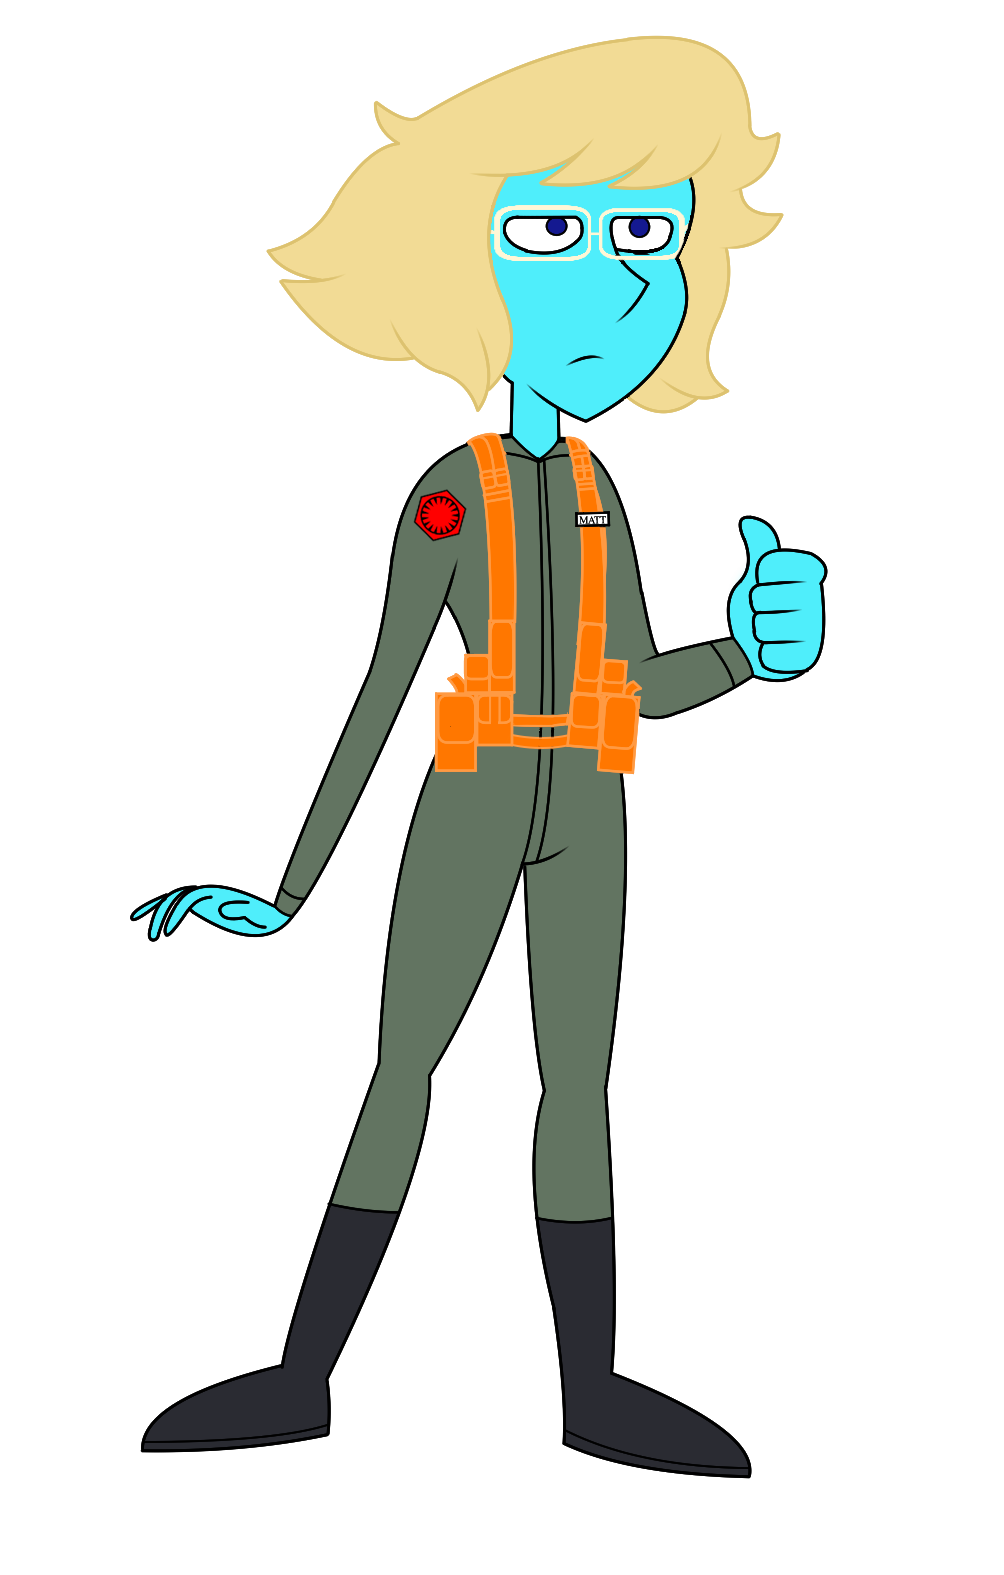 'Matt' the Radar Technician by MarkHoofman